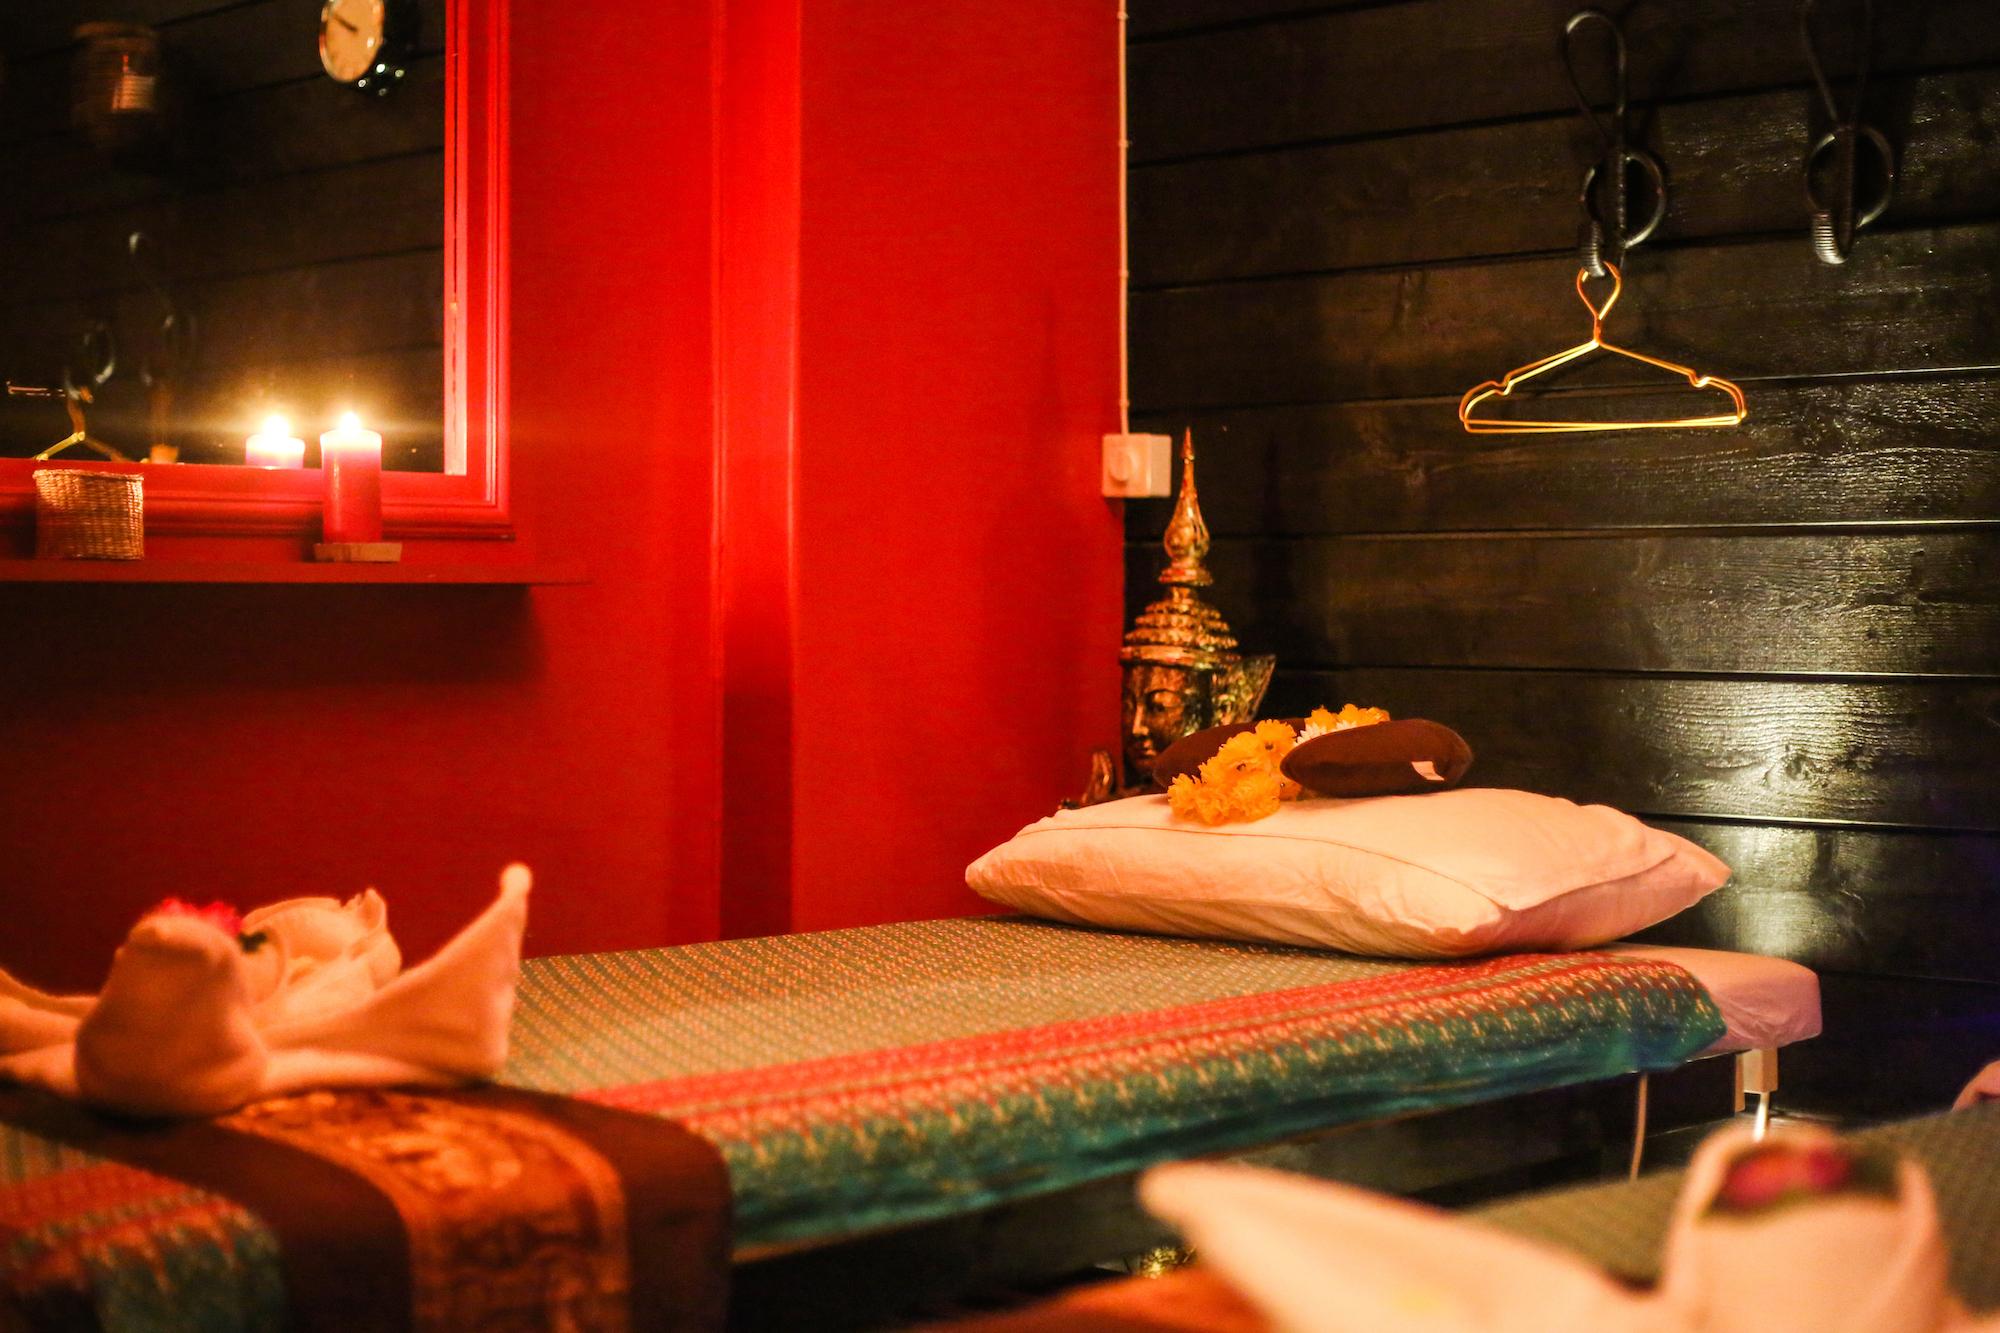 privat massage stockholm ferr sex